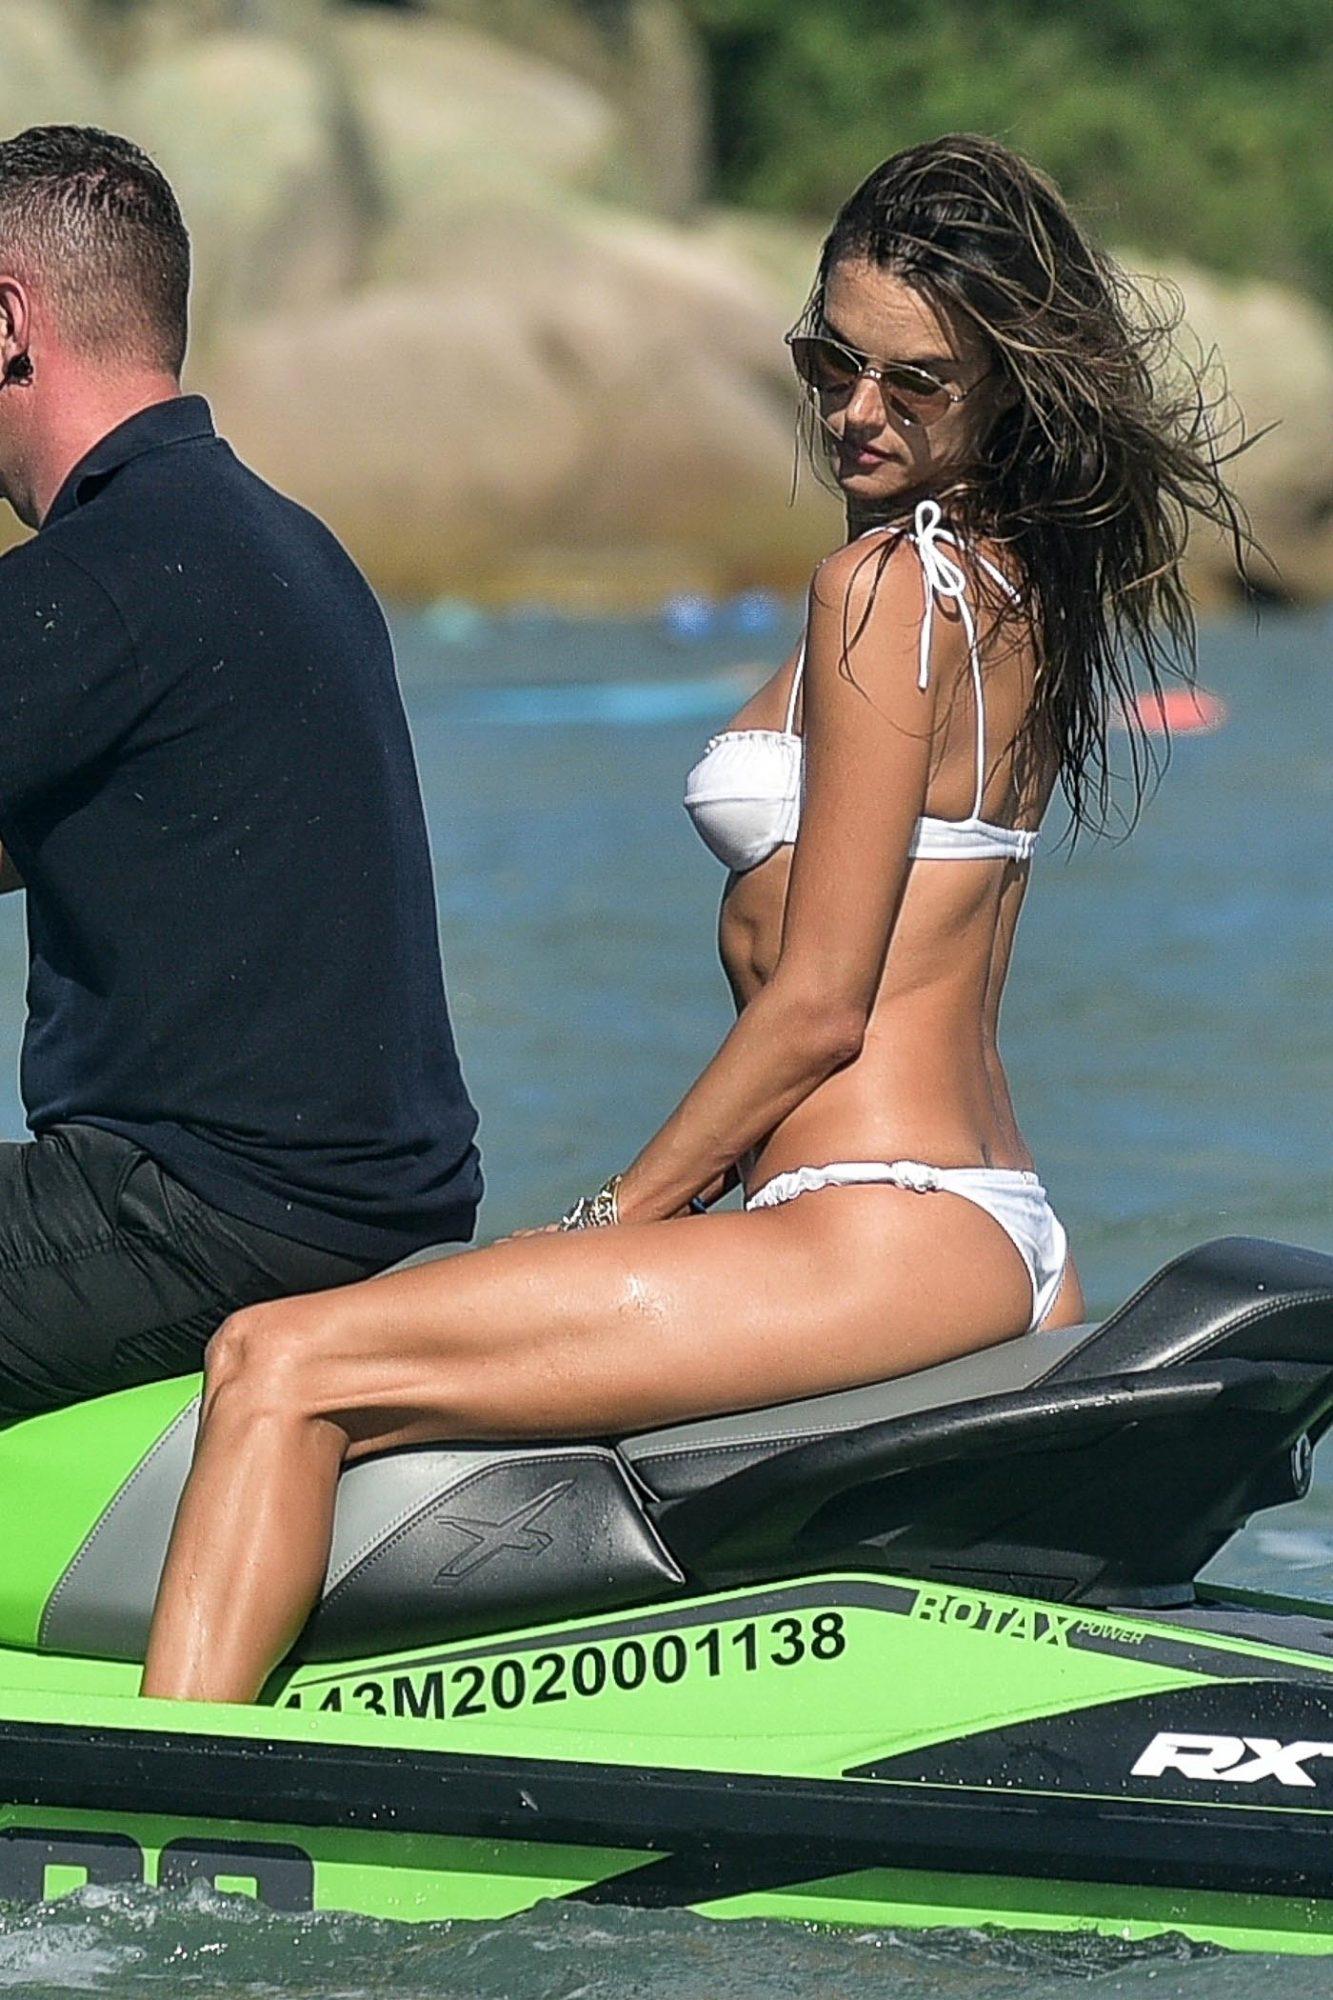 Alessandra Ambrosio Slips into a white Bikini to Ride a Jet Ski in Brazil